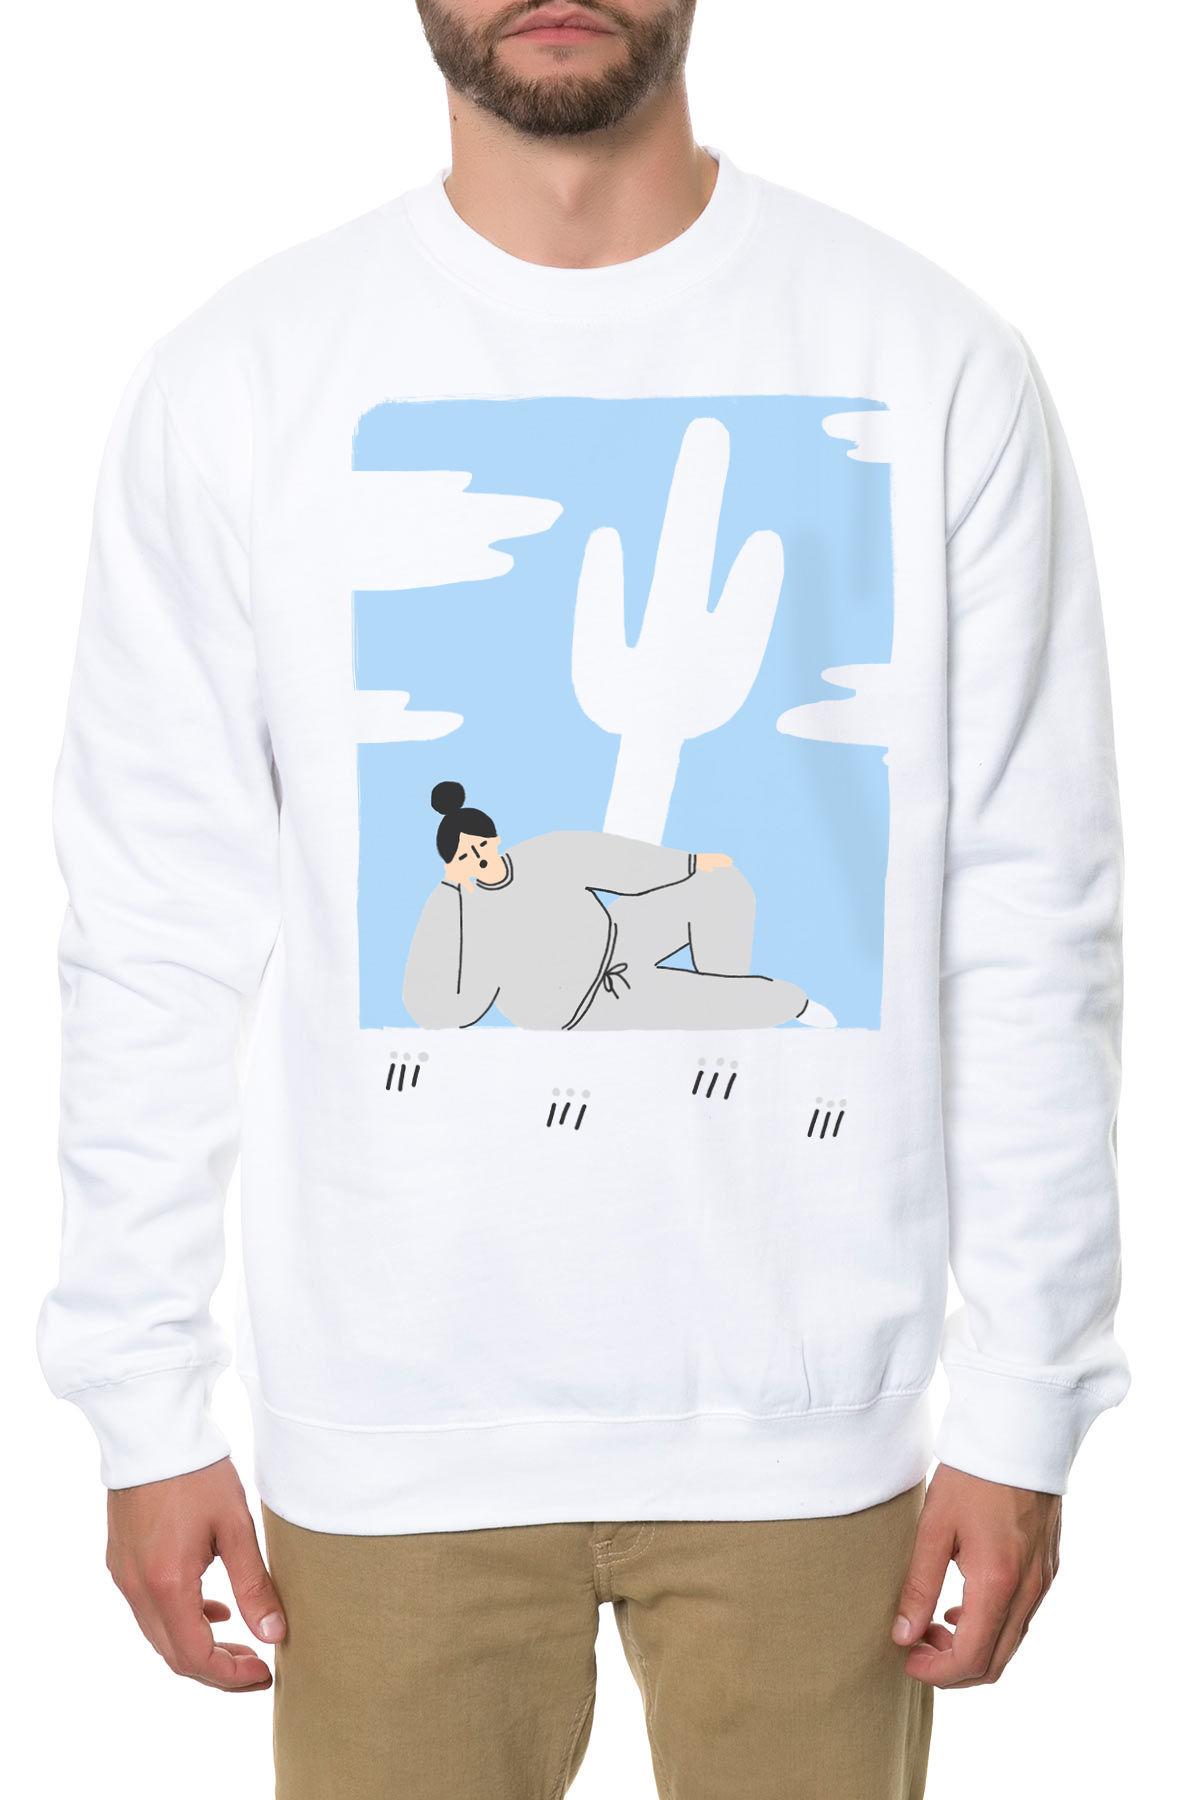 Image of The Guzu Crewneck Sweatshirt in White